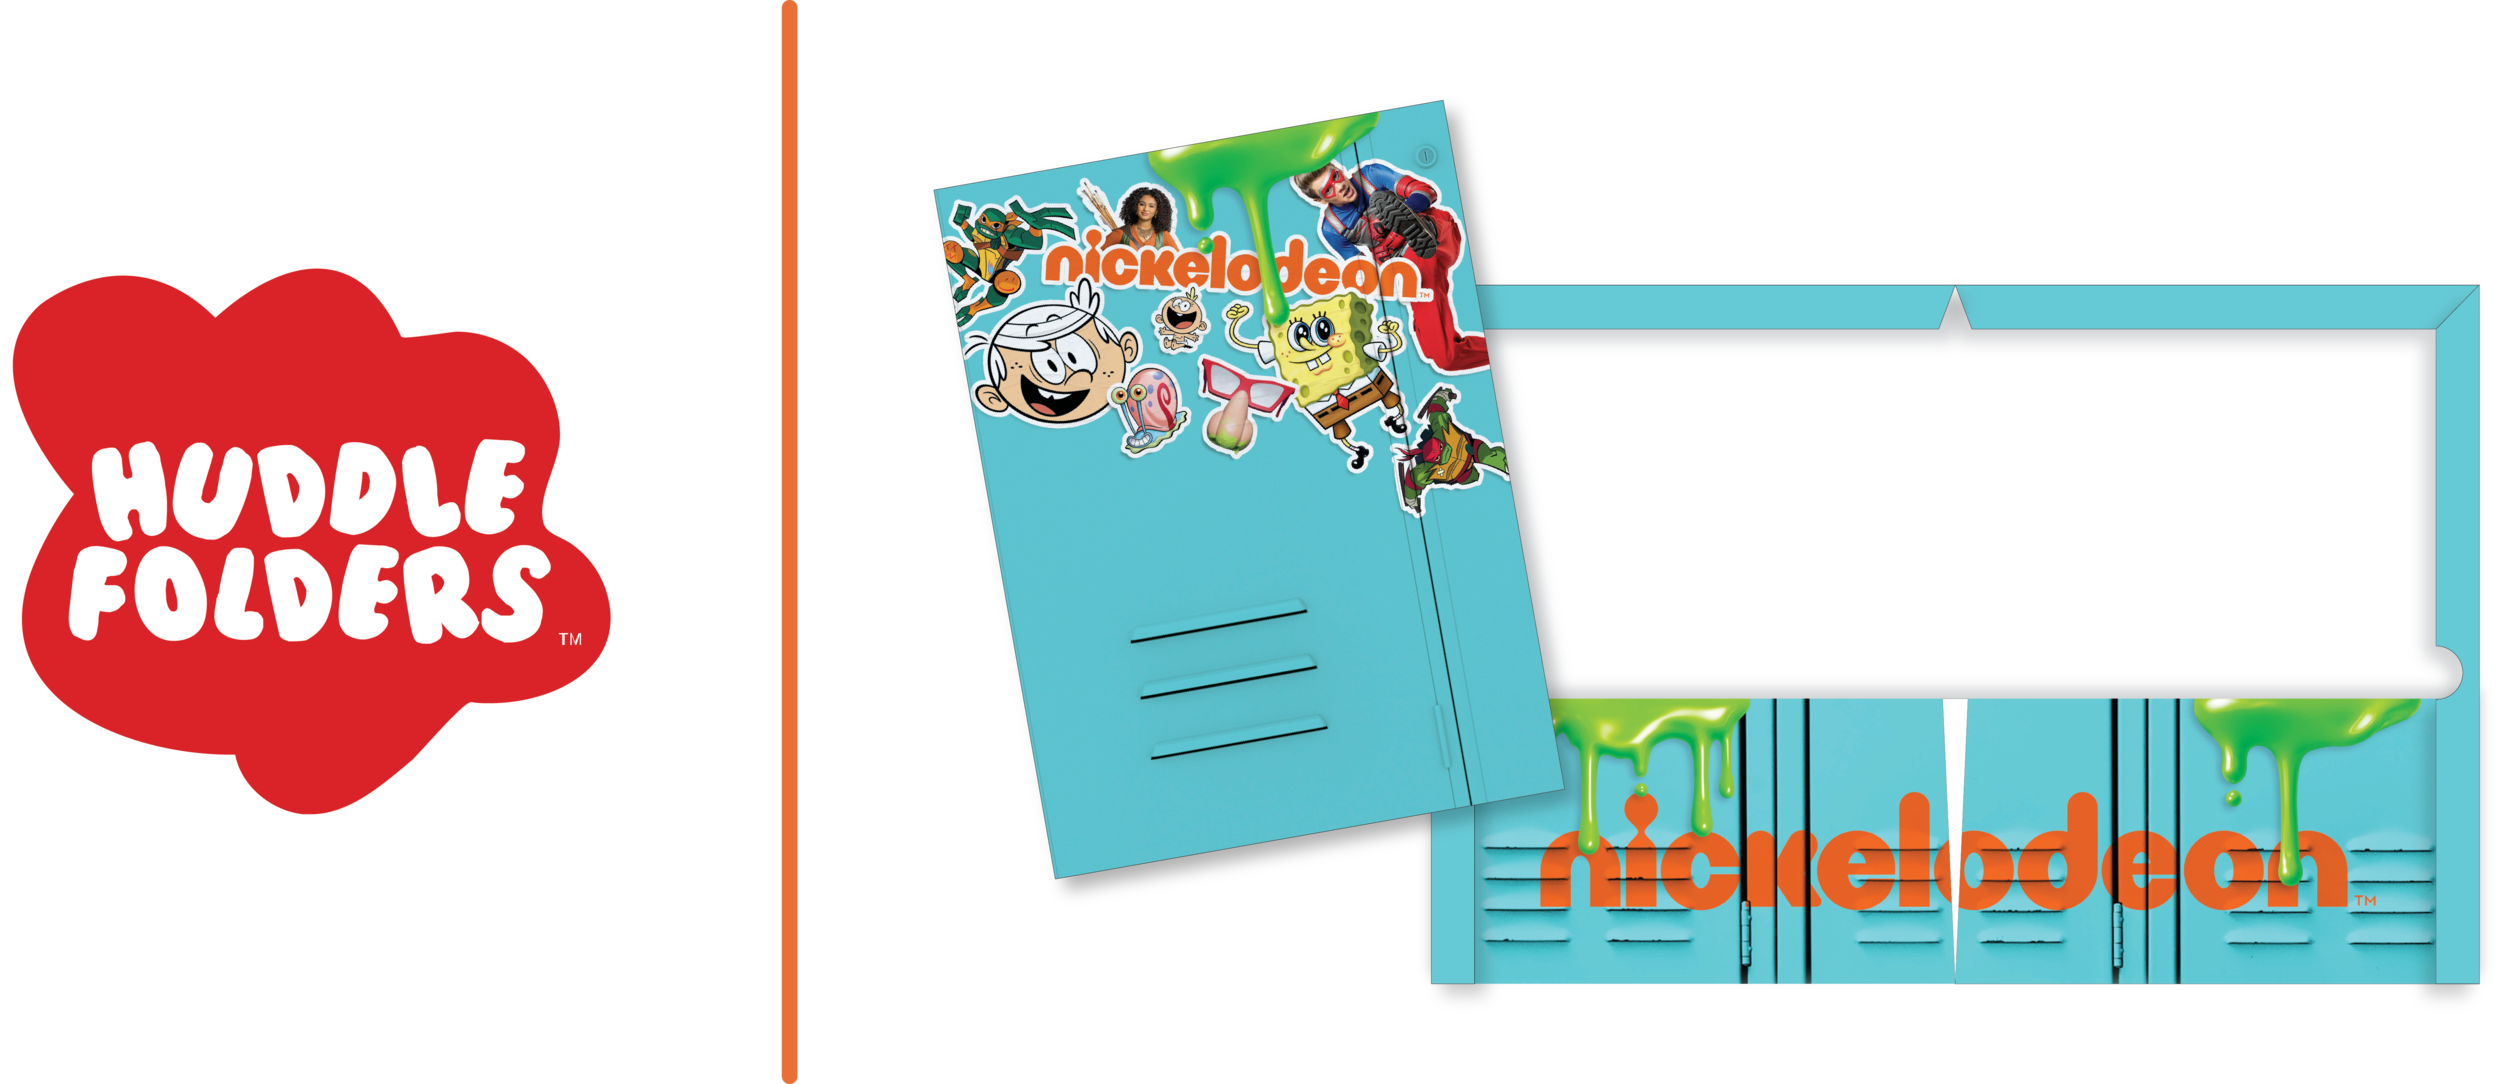 HuddleFolders + Nickelodeon MockUp.png